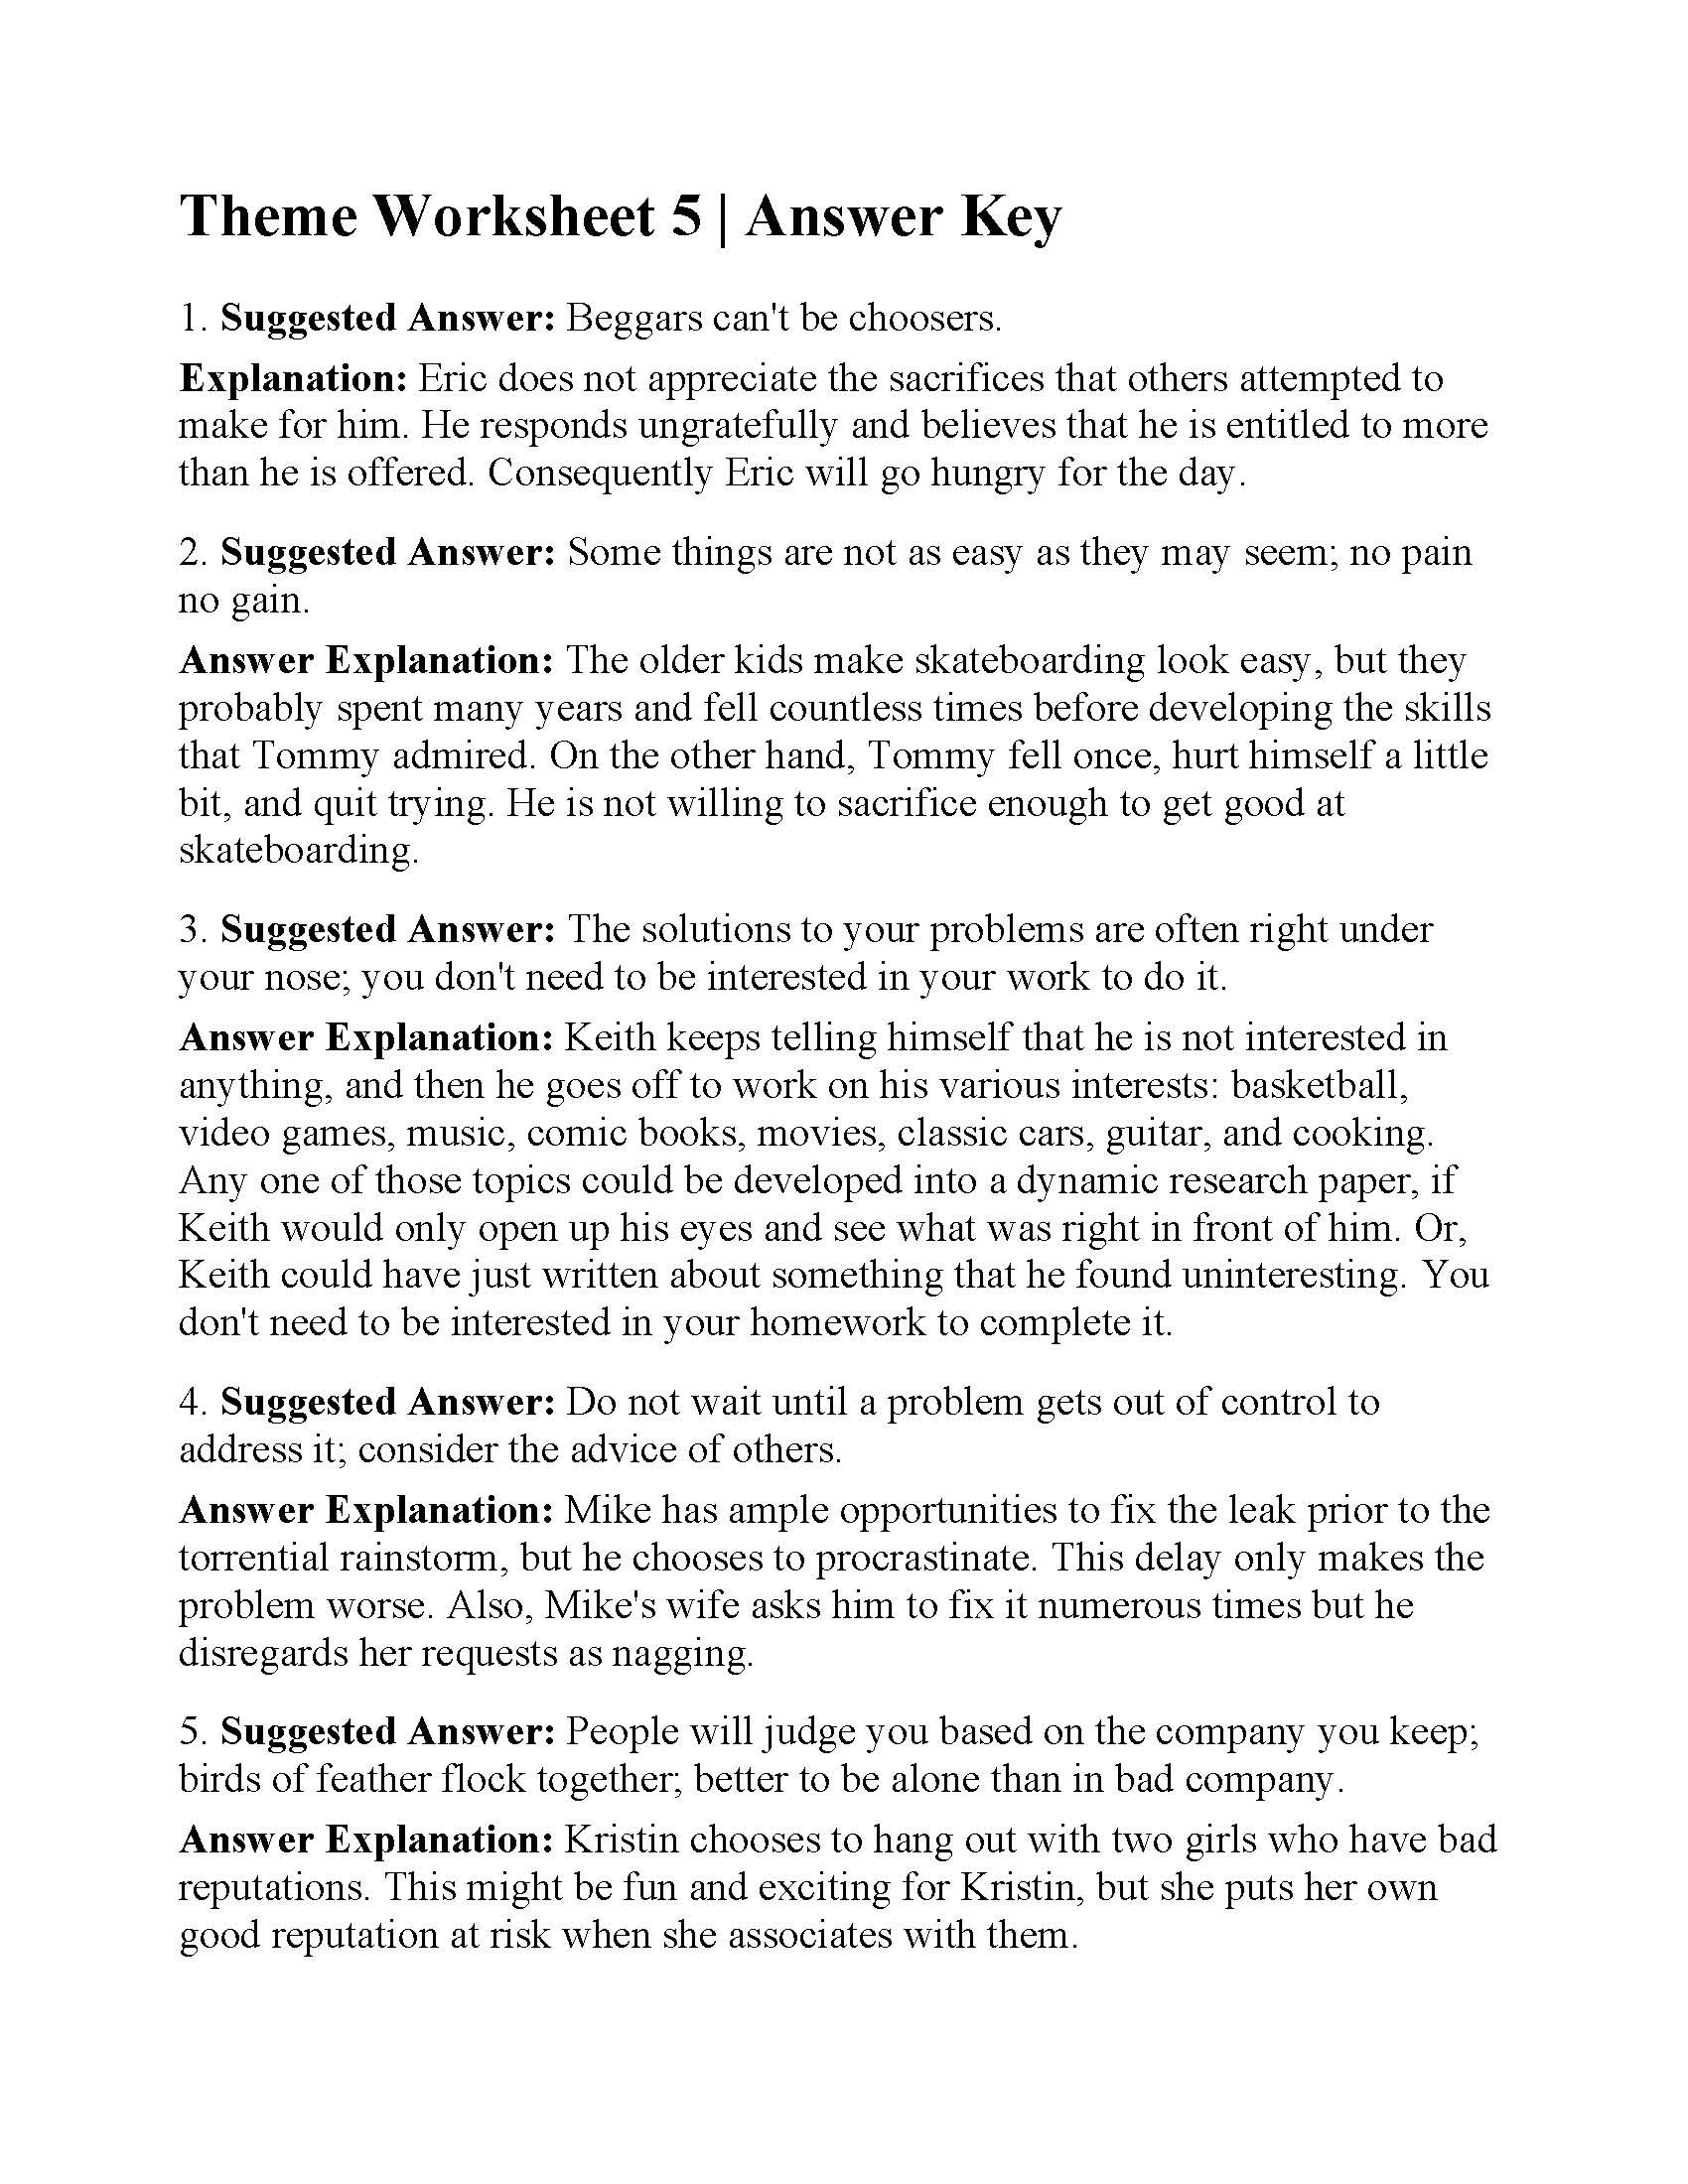 Theme Worksheets 5th Grade theme Worksheet 5